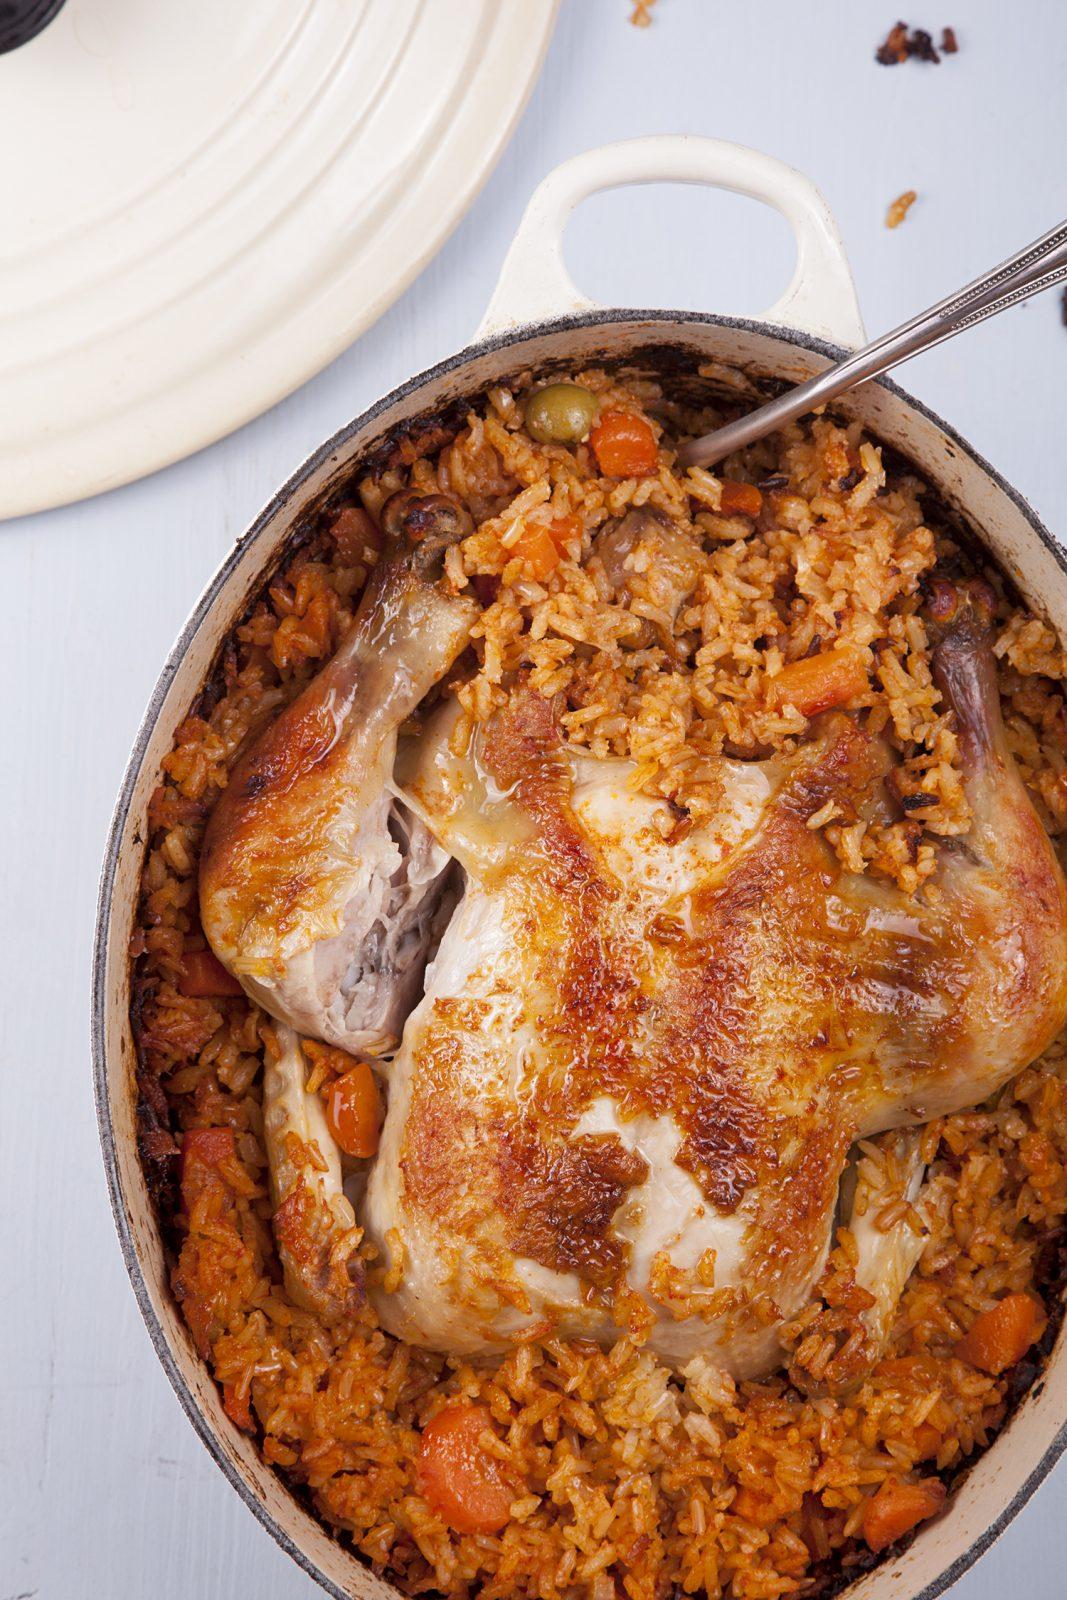 Chicken Baked in Rice - Delicious Gluten Free Recipe